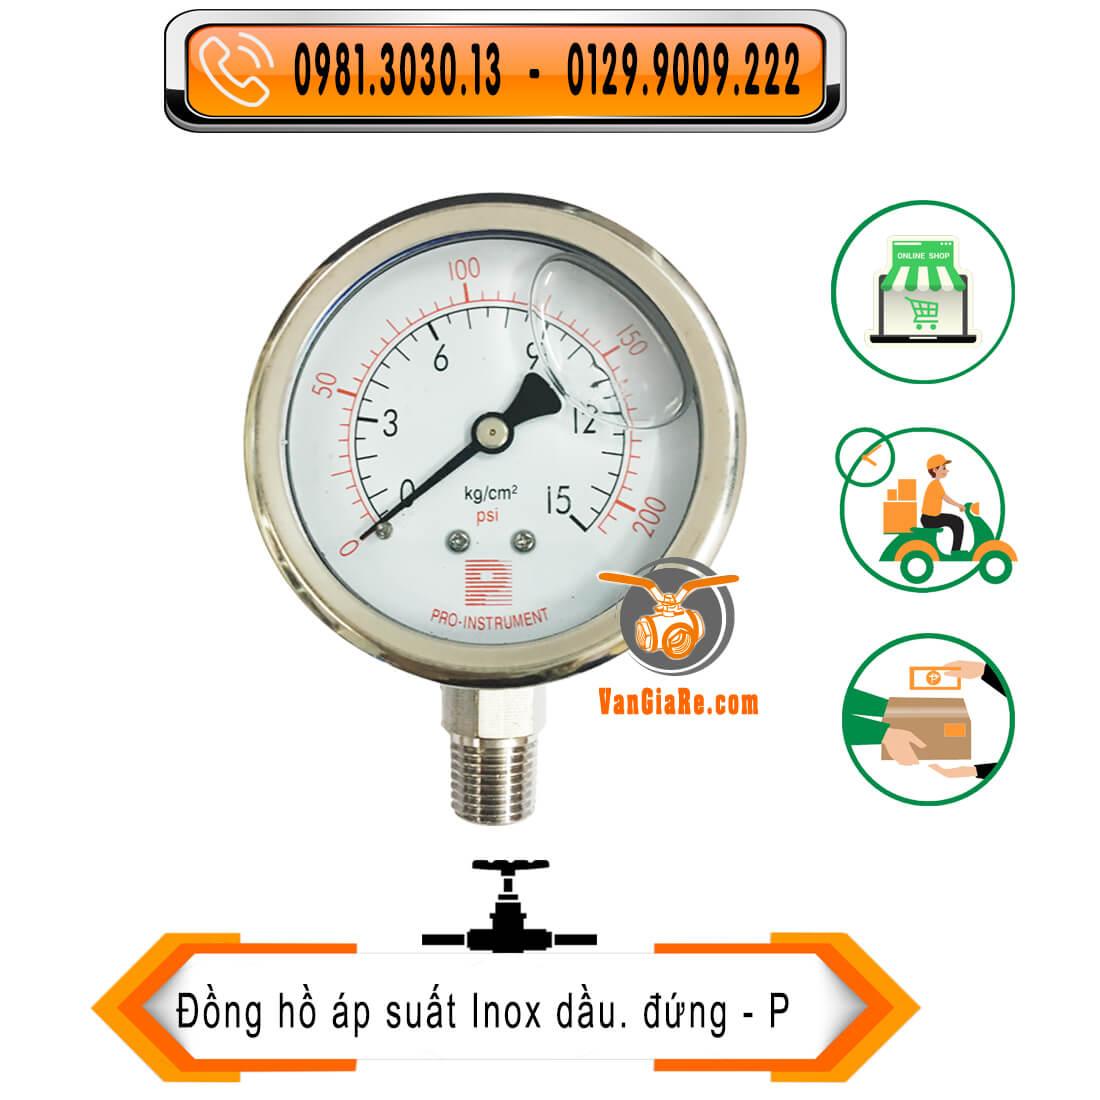 Đồng hồ áp suất inox 304 có dầu, hiệu Pro Instrument